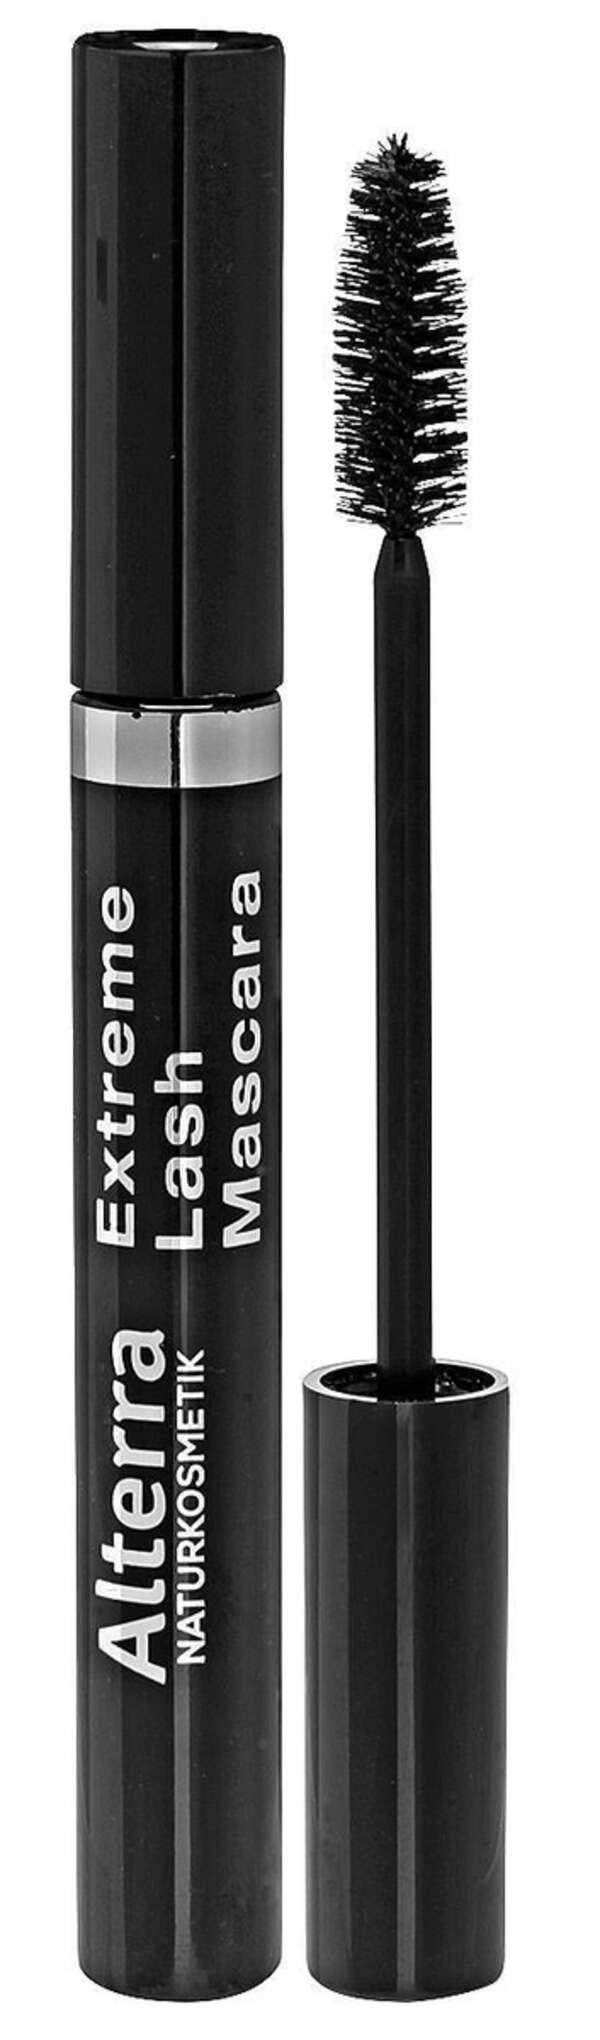 Alterra Extreme Lash Mascara